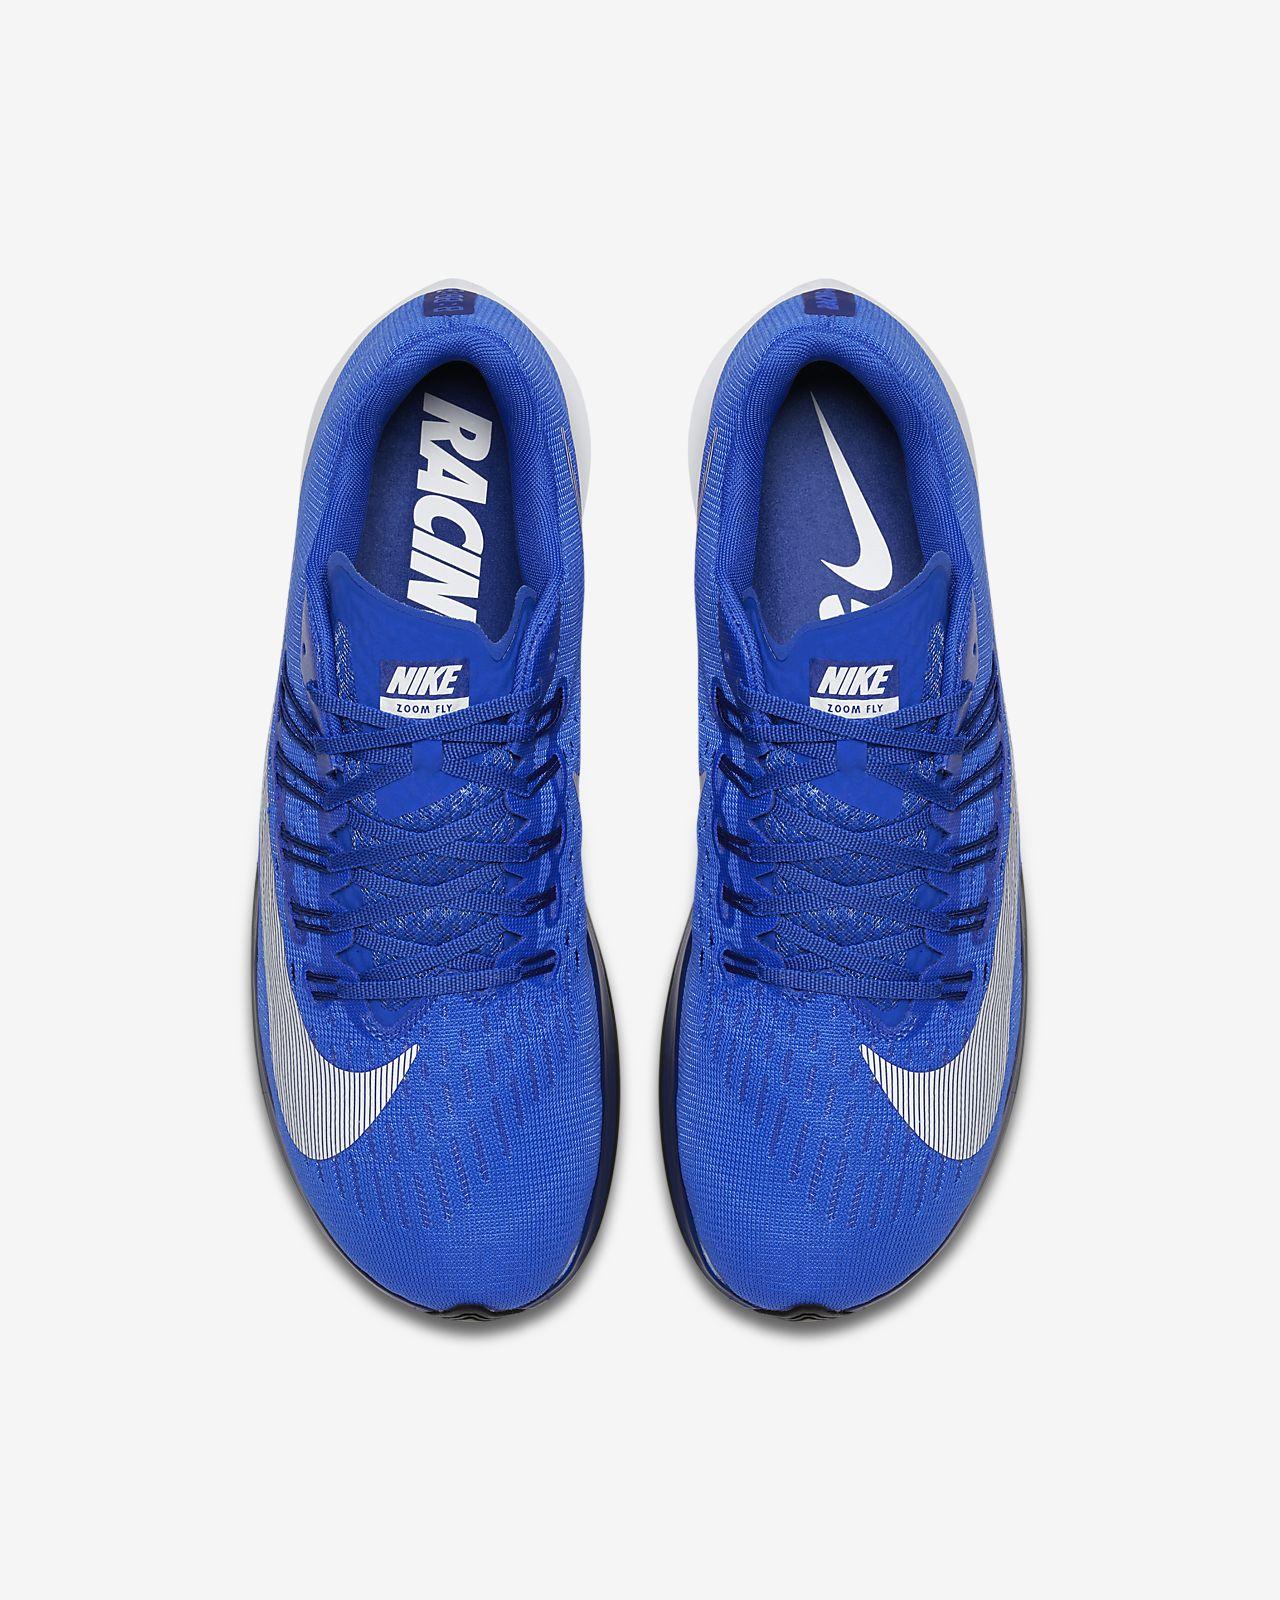 nike zoom fly royal blue